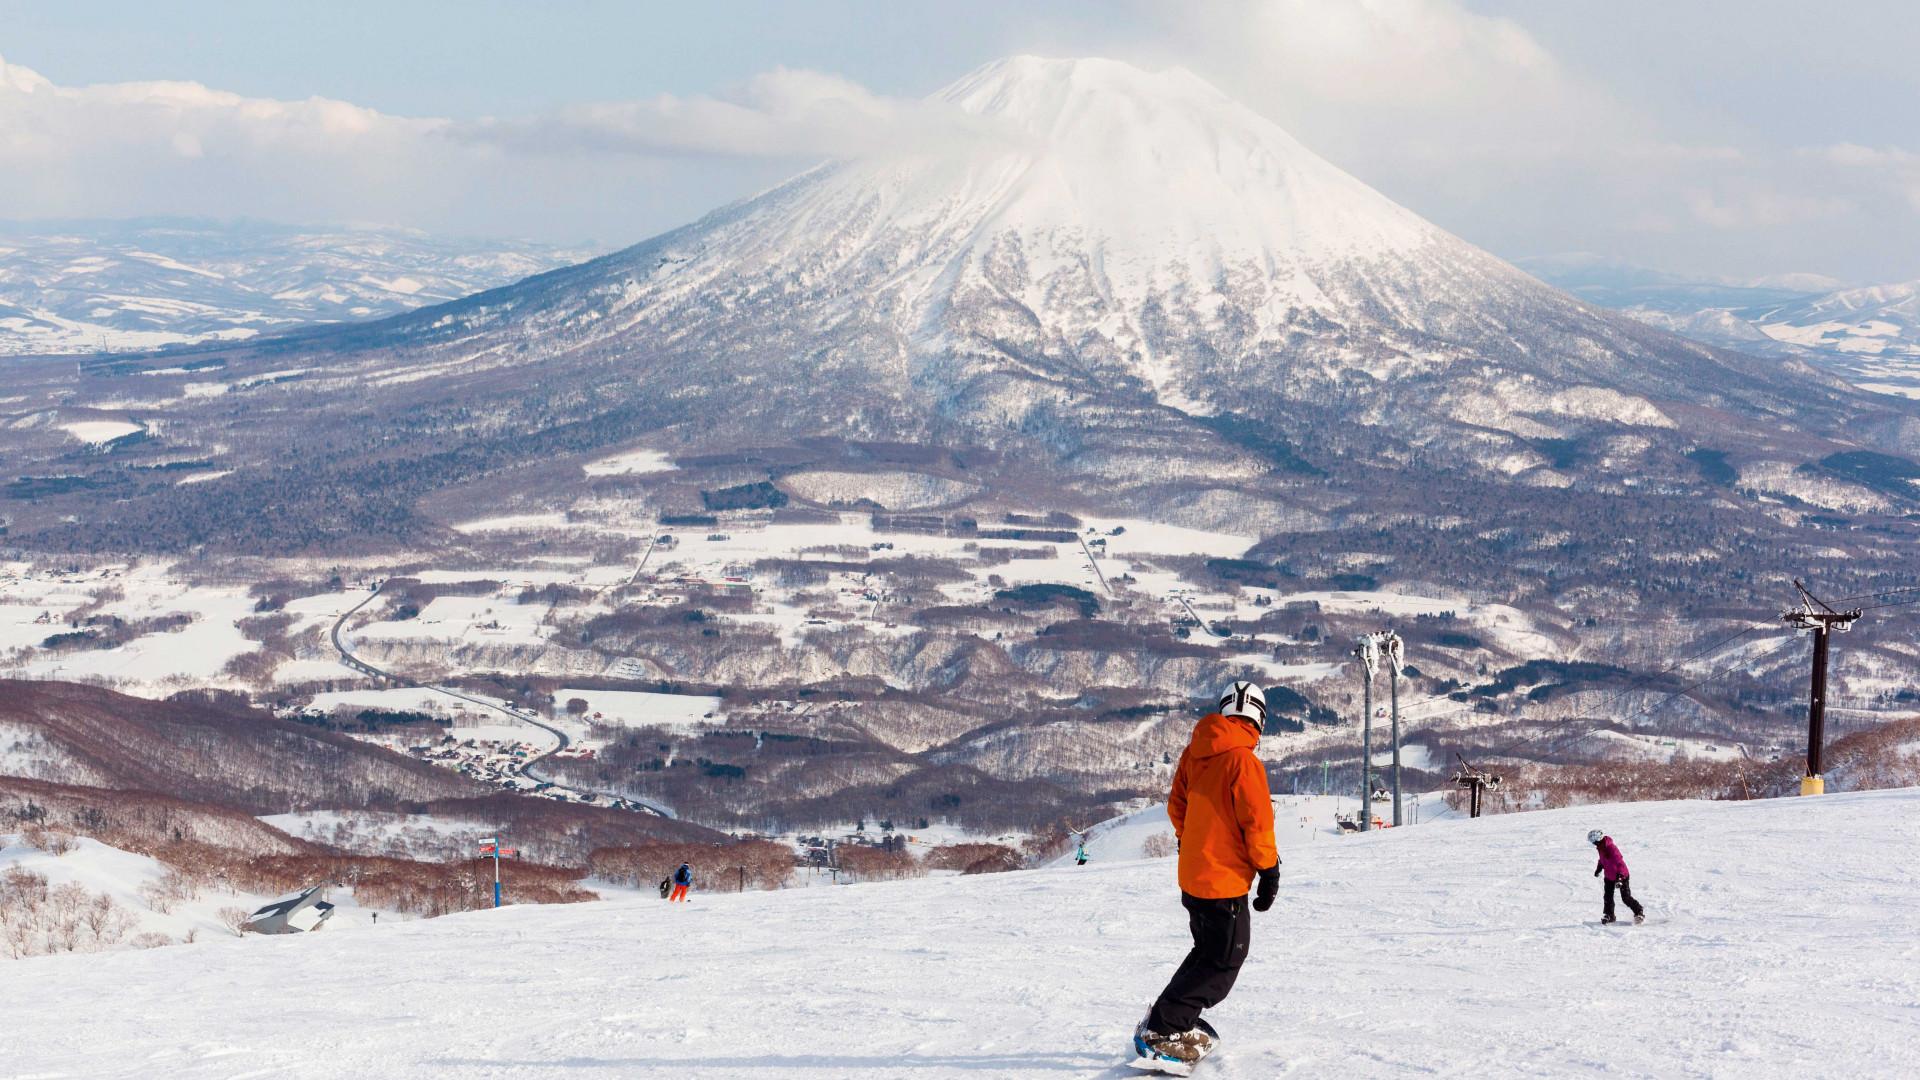 Snowboarder on slopes in Niseko, Japan, overlooking mountains